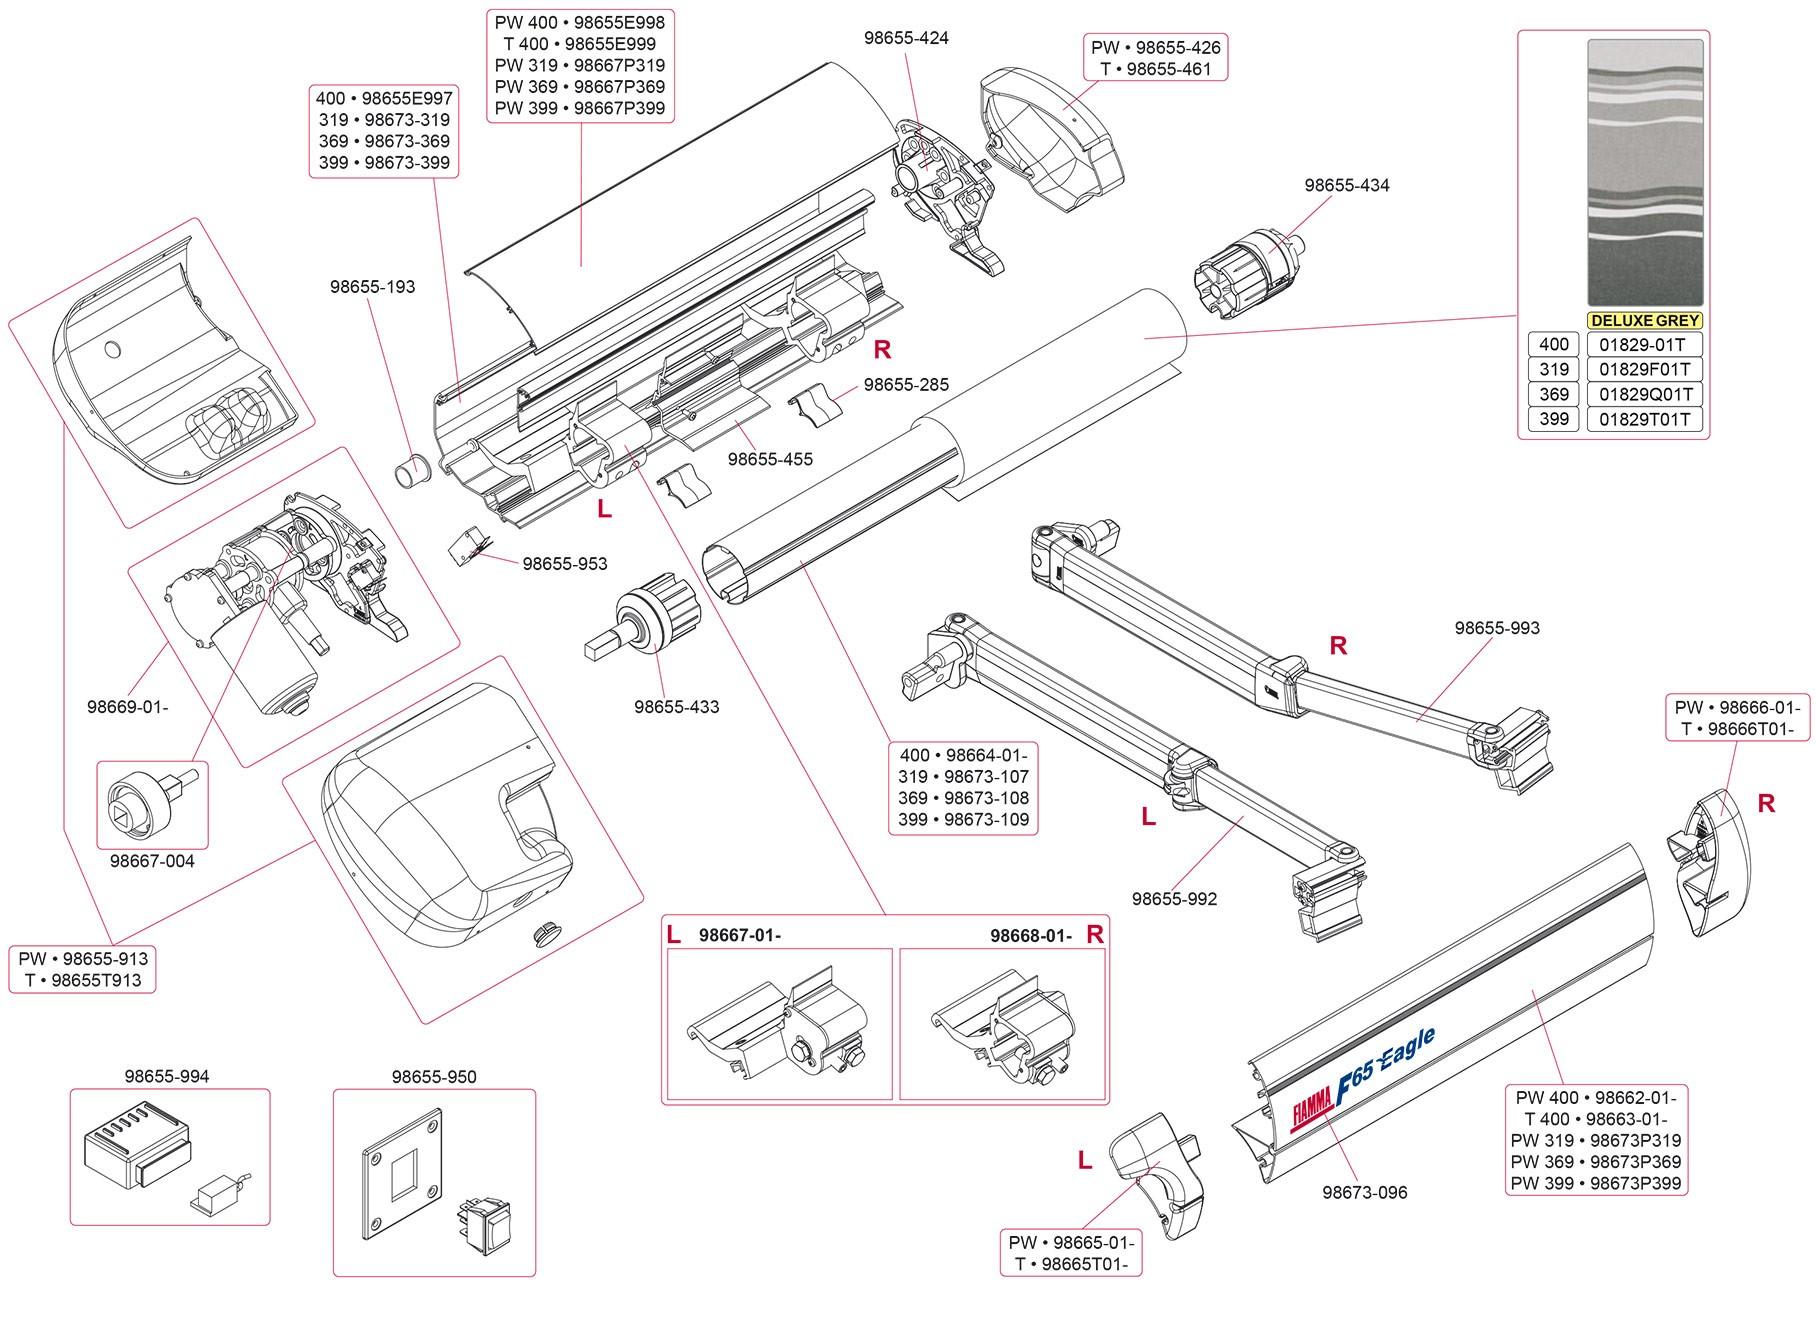 Fiamma awnings, Fiamma Bike Rack and Fiamma Ultra-Box for ...